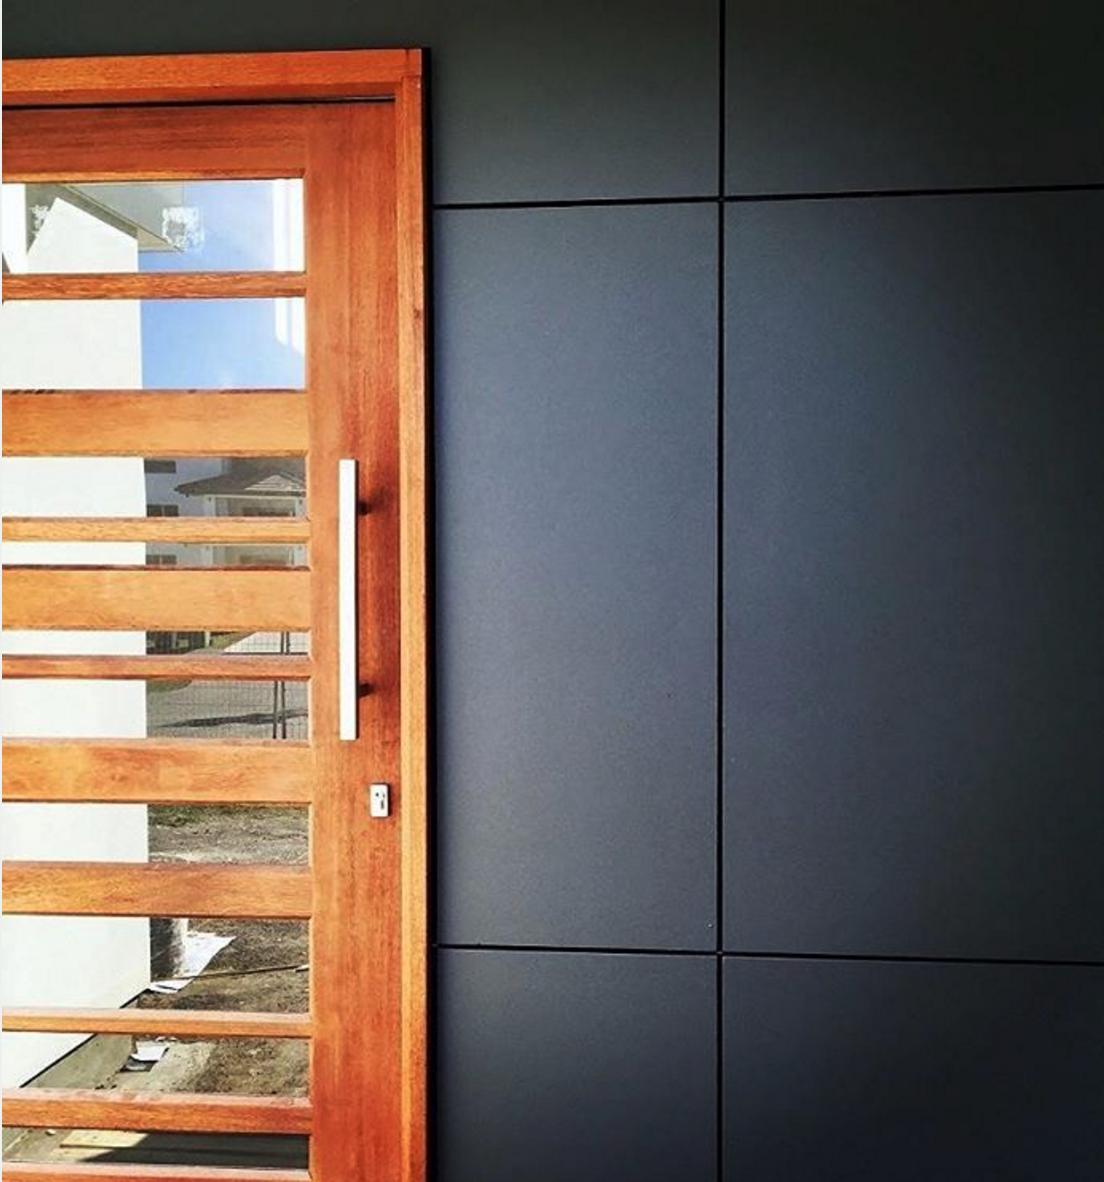 Scyon matrix wall cladding home pinterest cladding - Exterior wall materials philippines ...